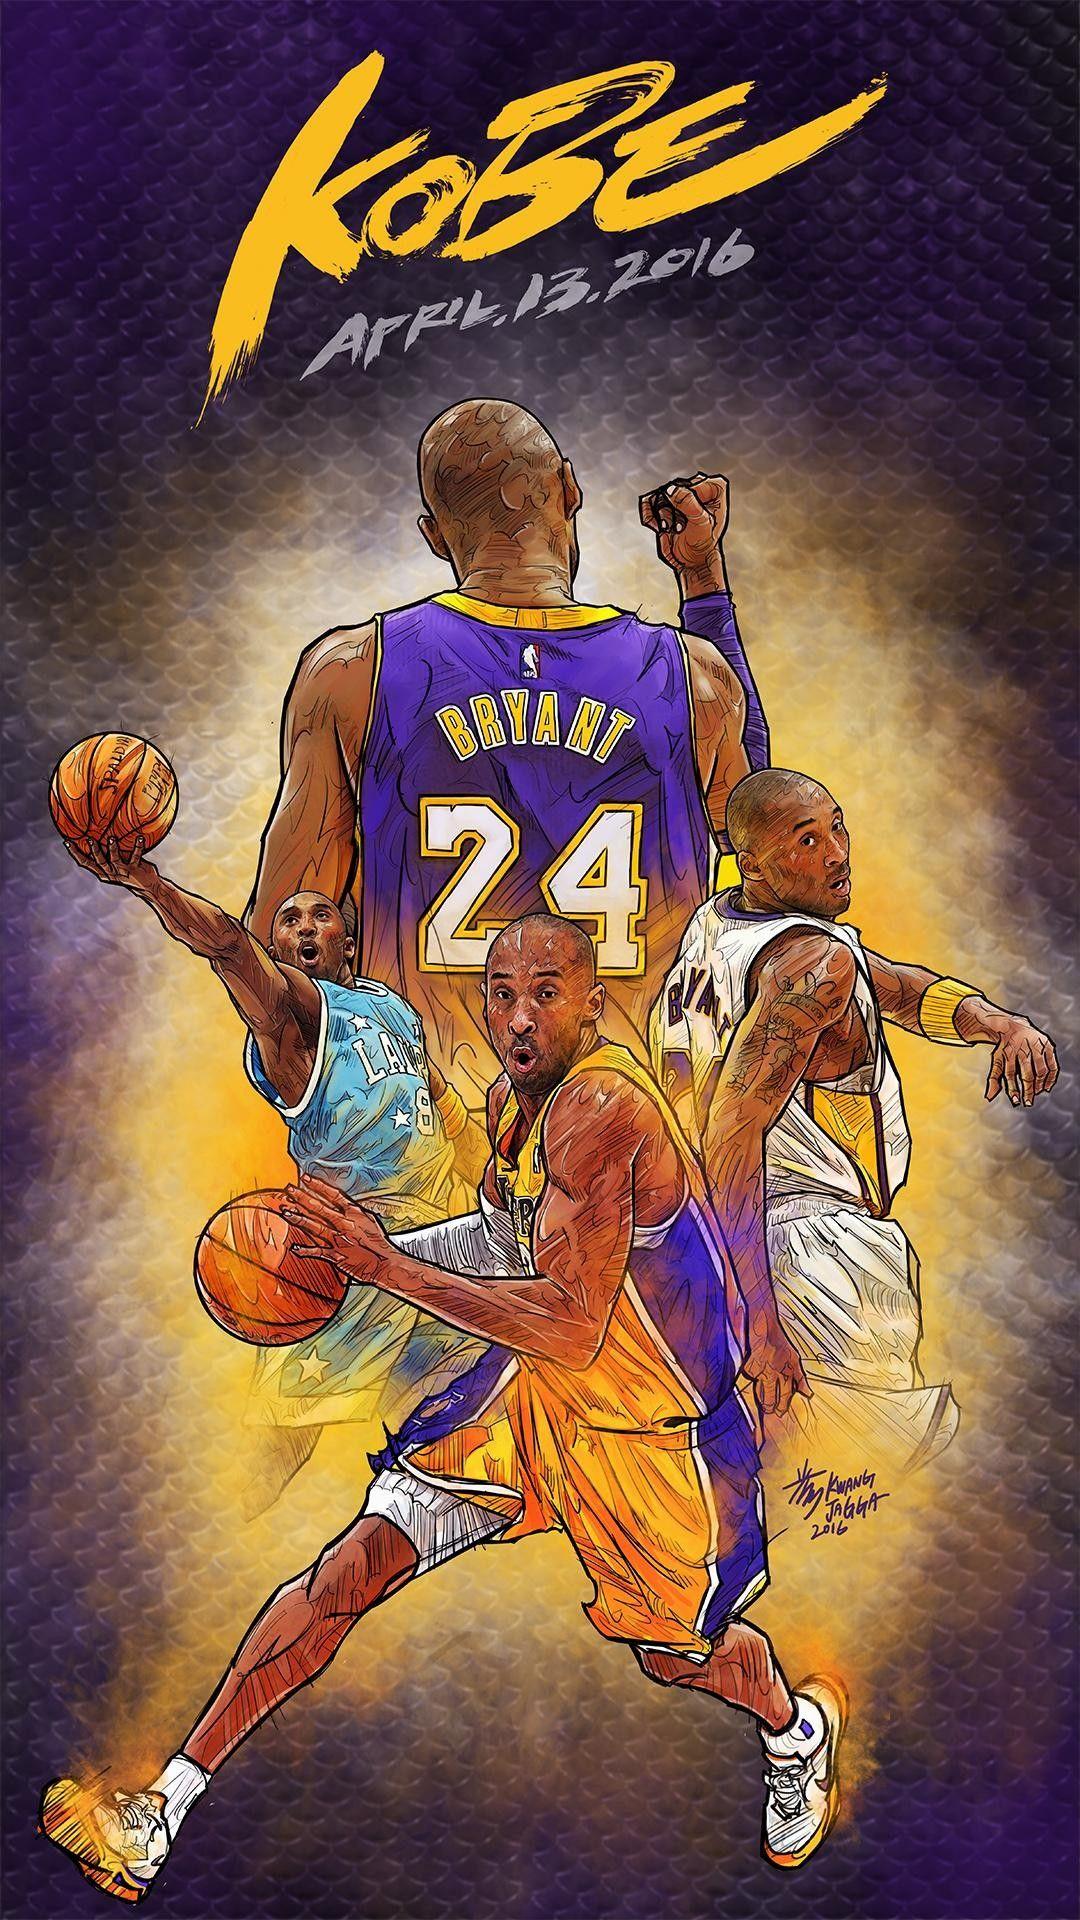 Cool Basketball Wallpaper Download In 2020 Kobe Bryant Pictures Kobe Bryant Poster Kobe Bryant Wallpaper